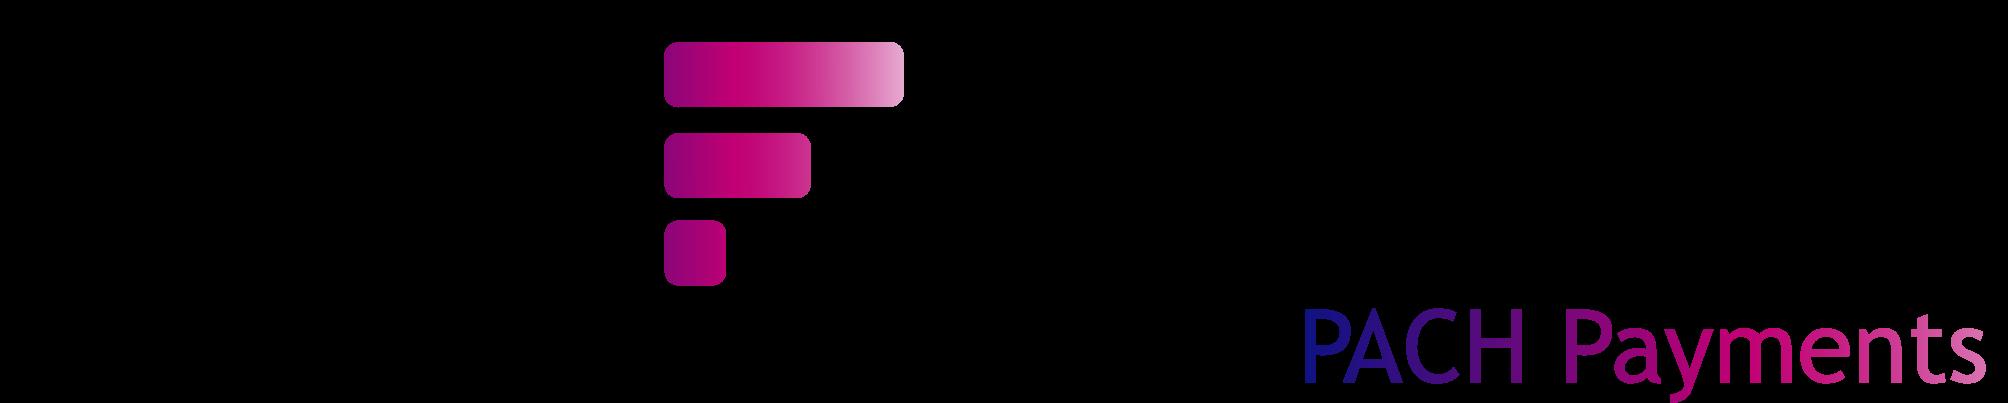 ULIS Fintech Corp